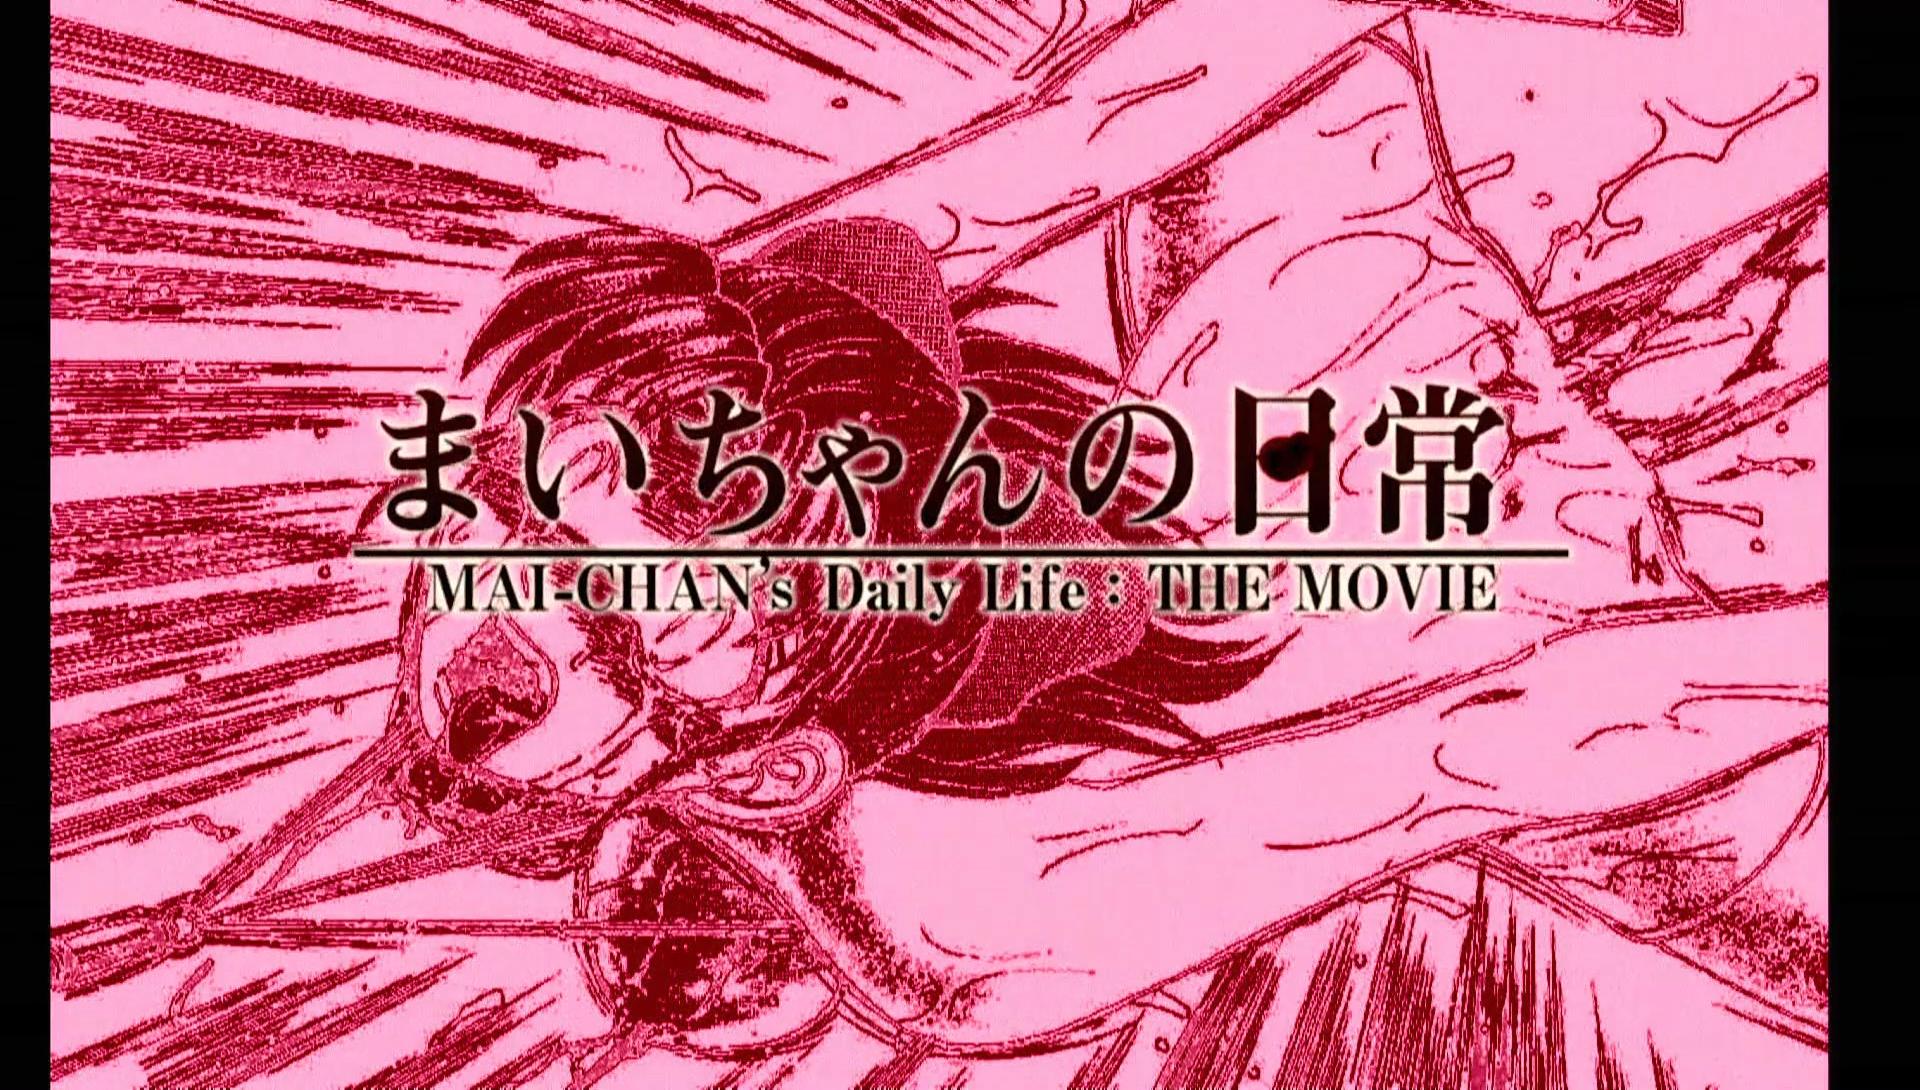 MAI-CHAN'S DAILY LIFE: THE MOVIE (まいちゃんの日常) de Satô Sade (2014)